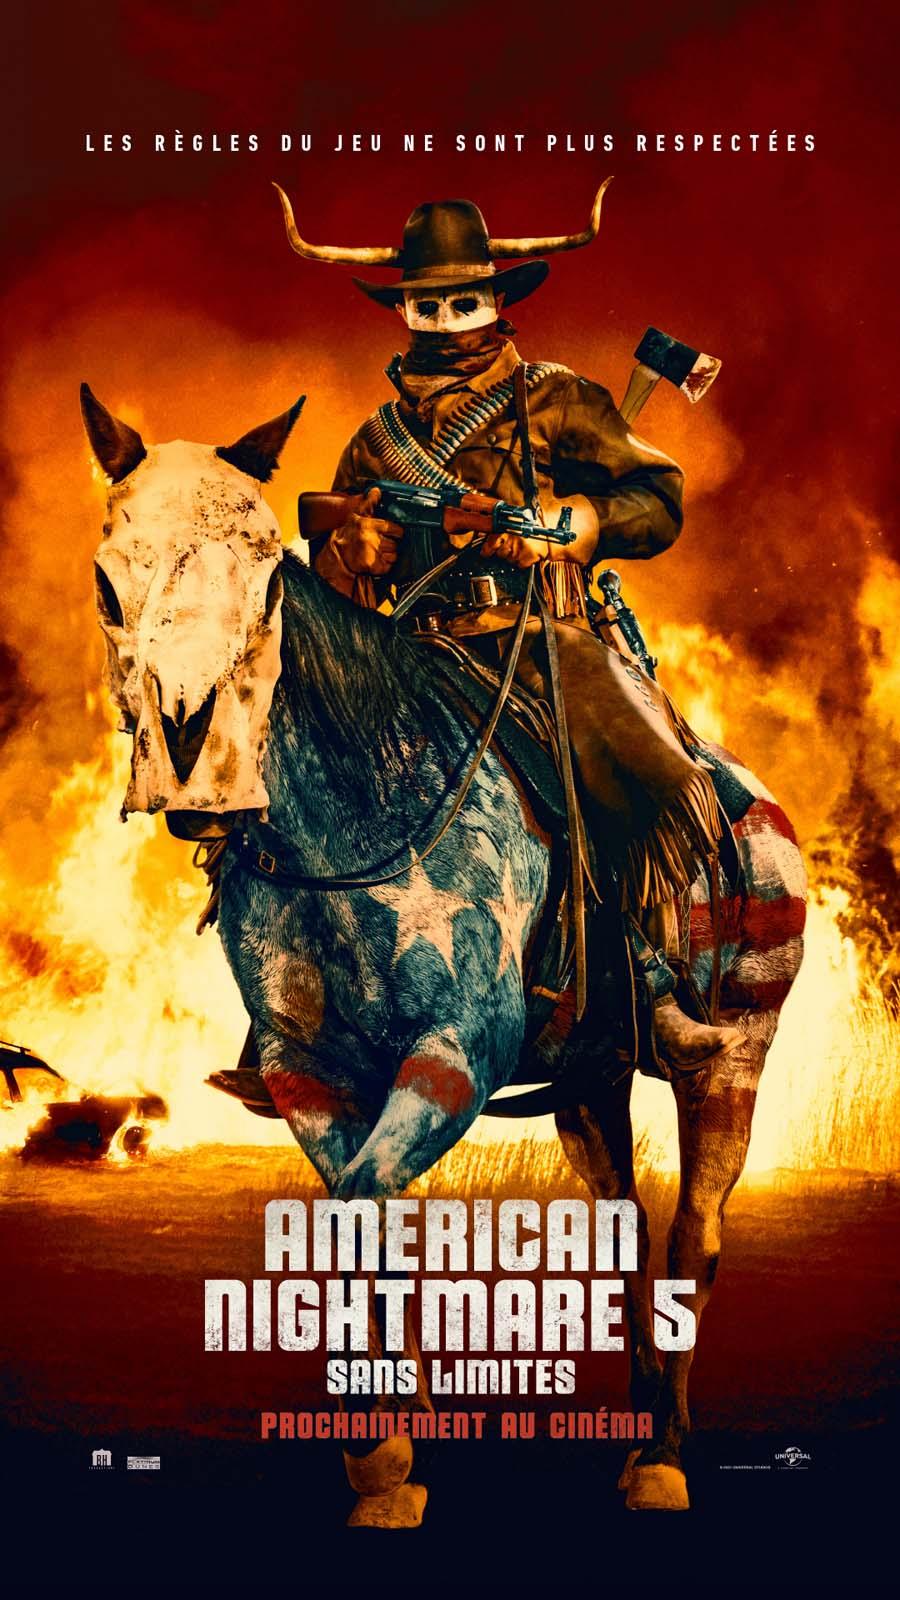 affiche du film American Nightmare 5 : Sans limites